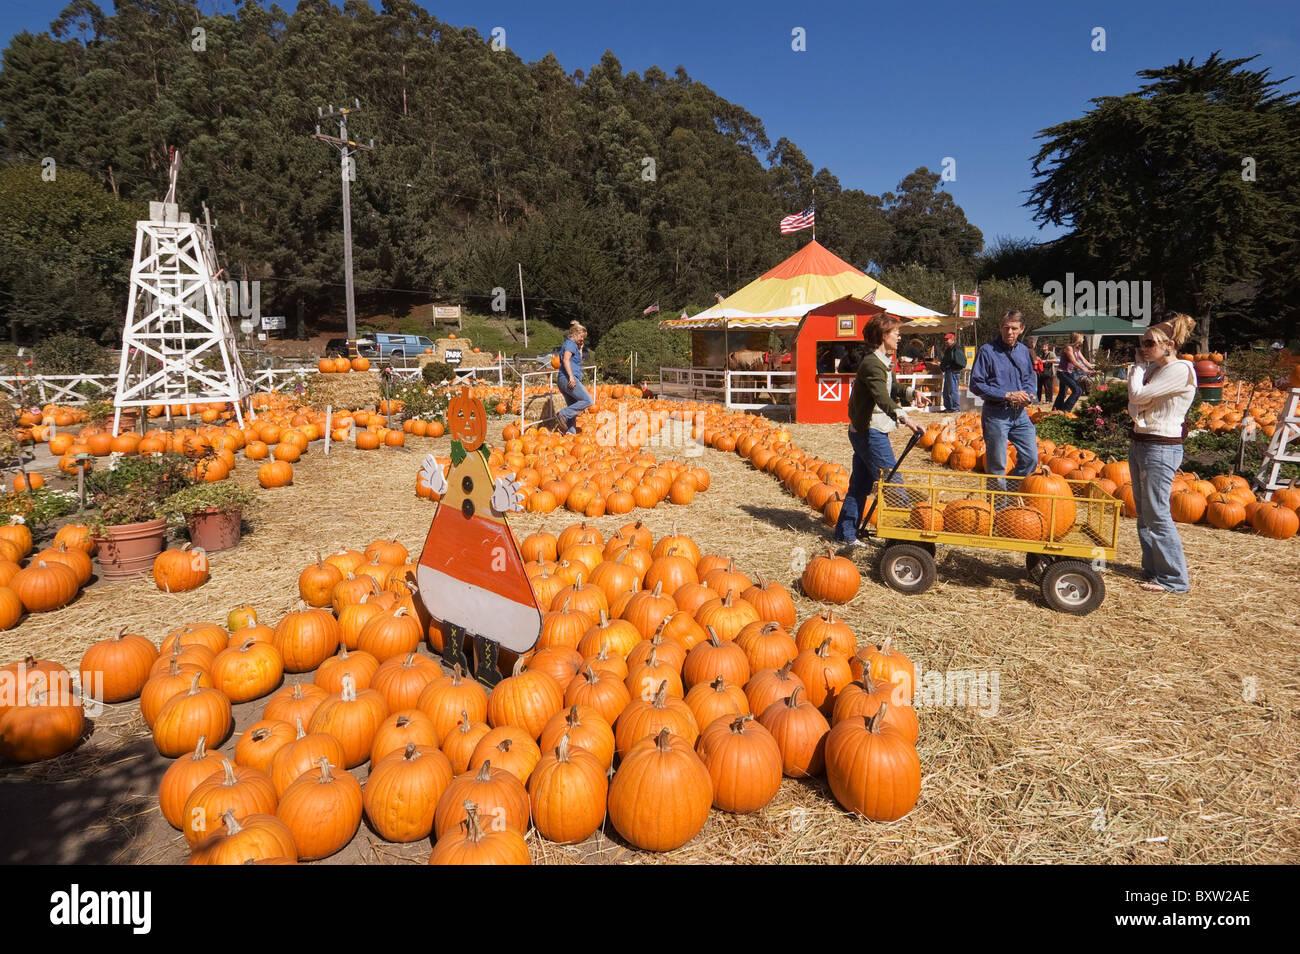 Half Moon Bay Pumpkin Festival 2020.Half Moon Bay Ca Stock Photos Half Moon Bay Ca Stock